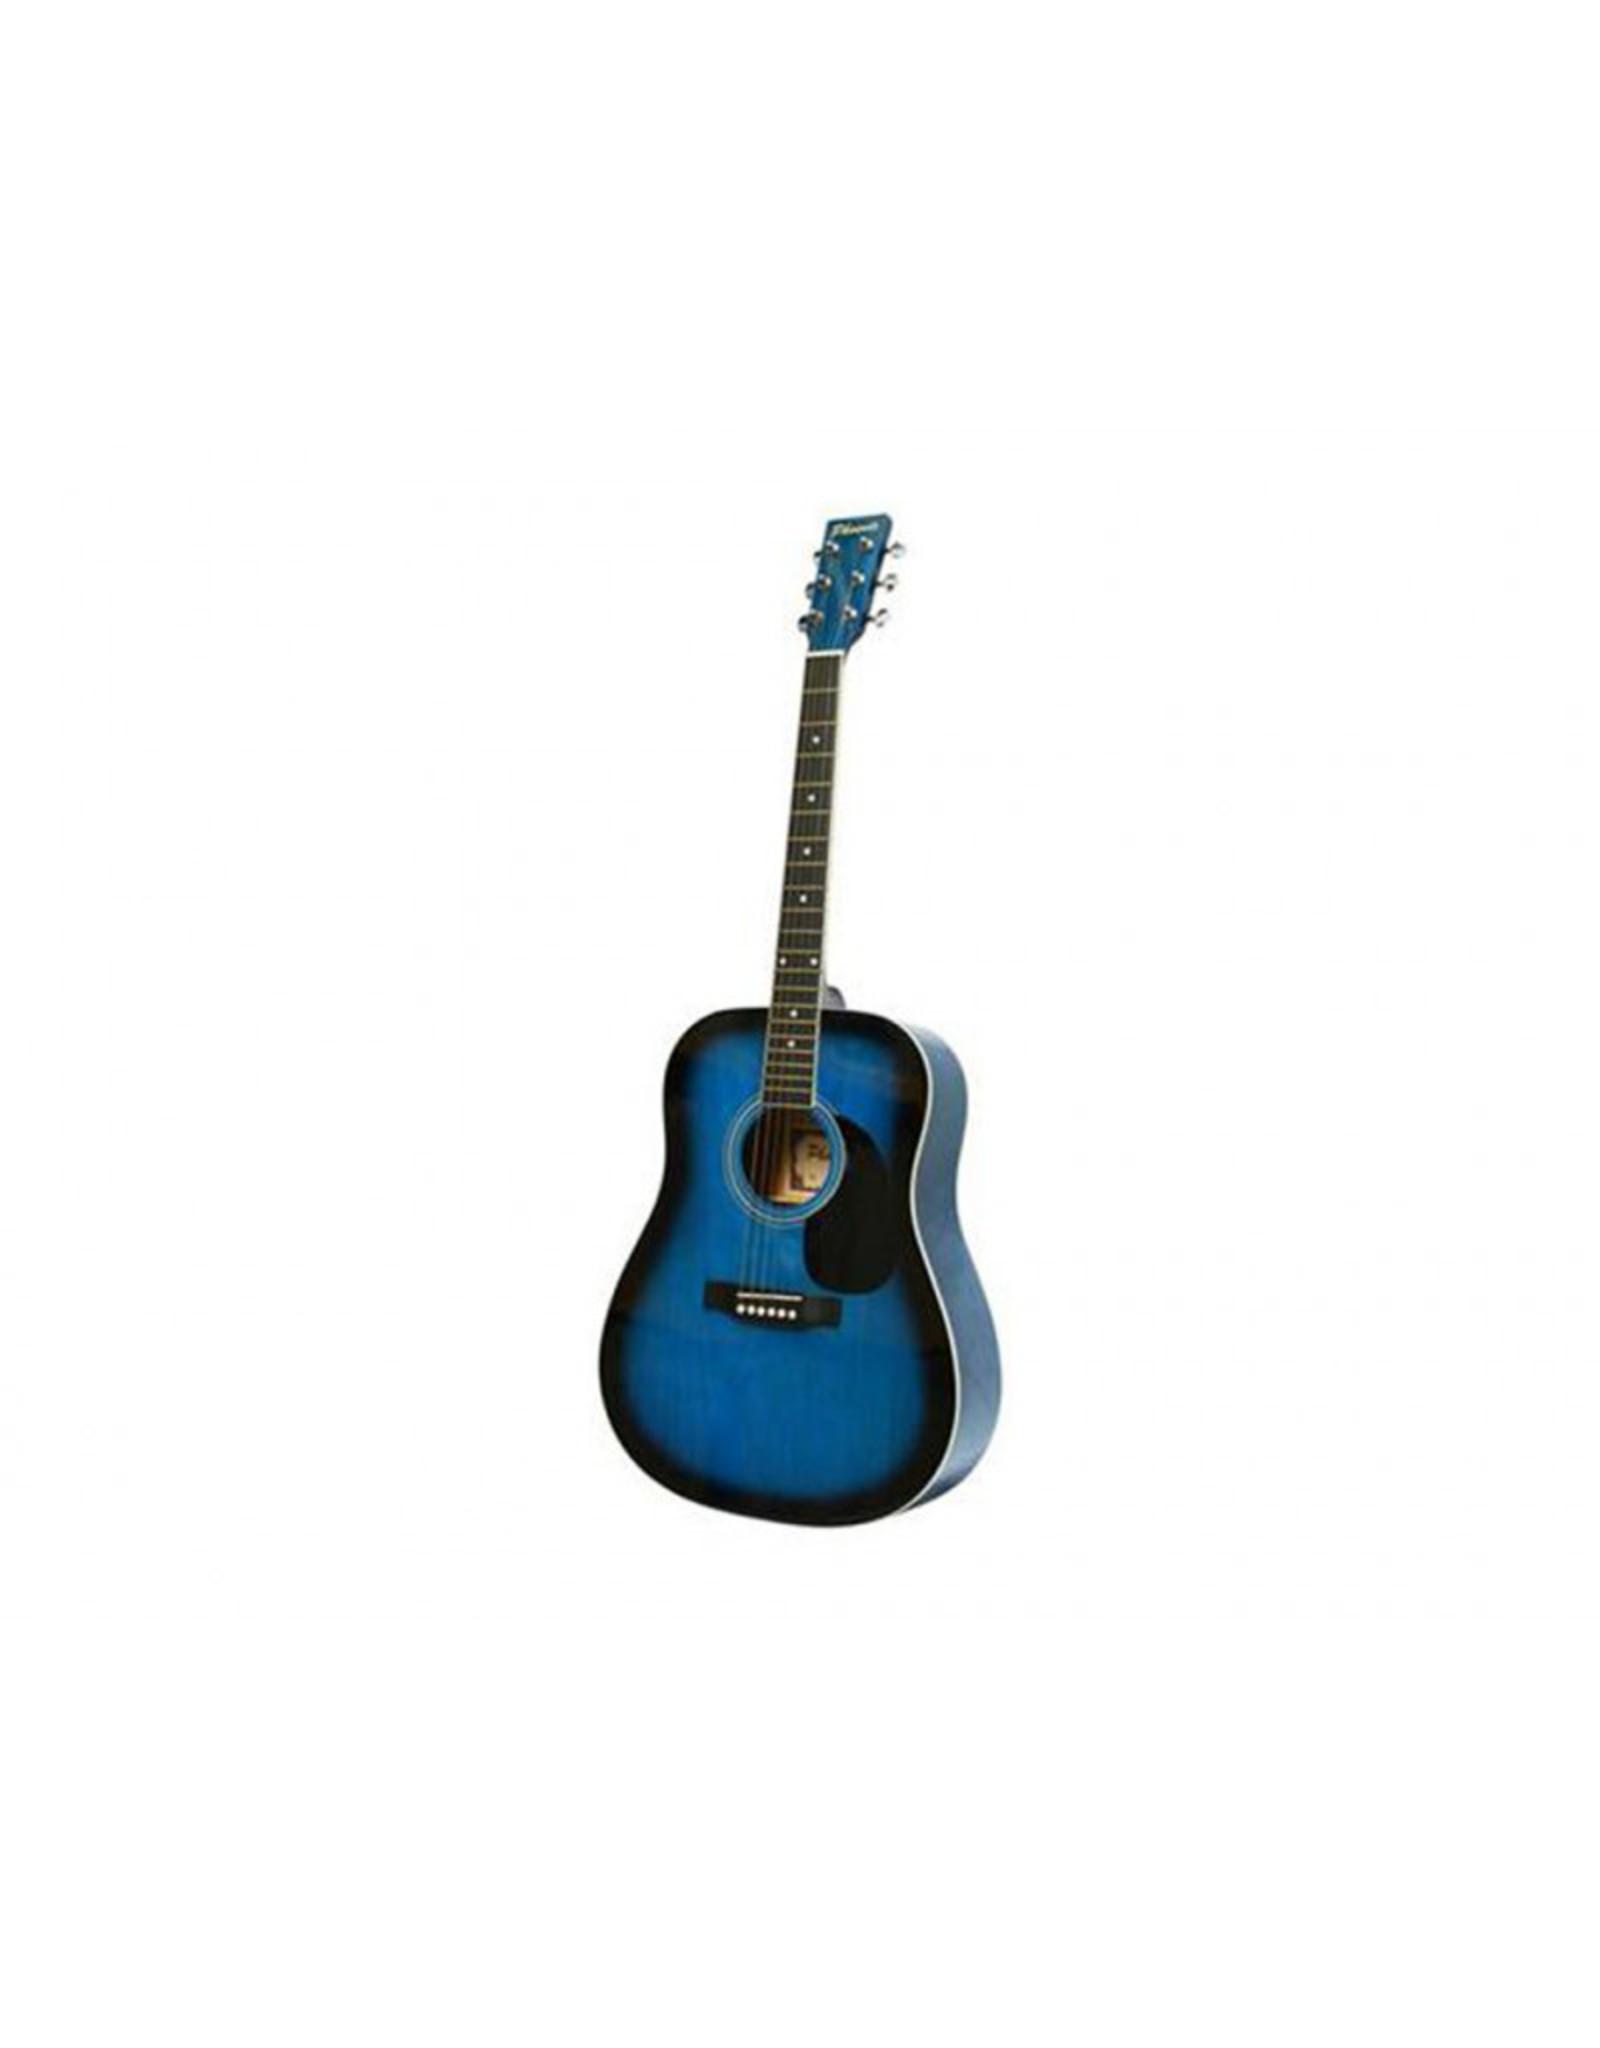 Phoenix Phoenix Western Guitar 001 Blue Sunburst